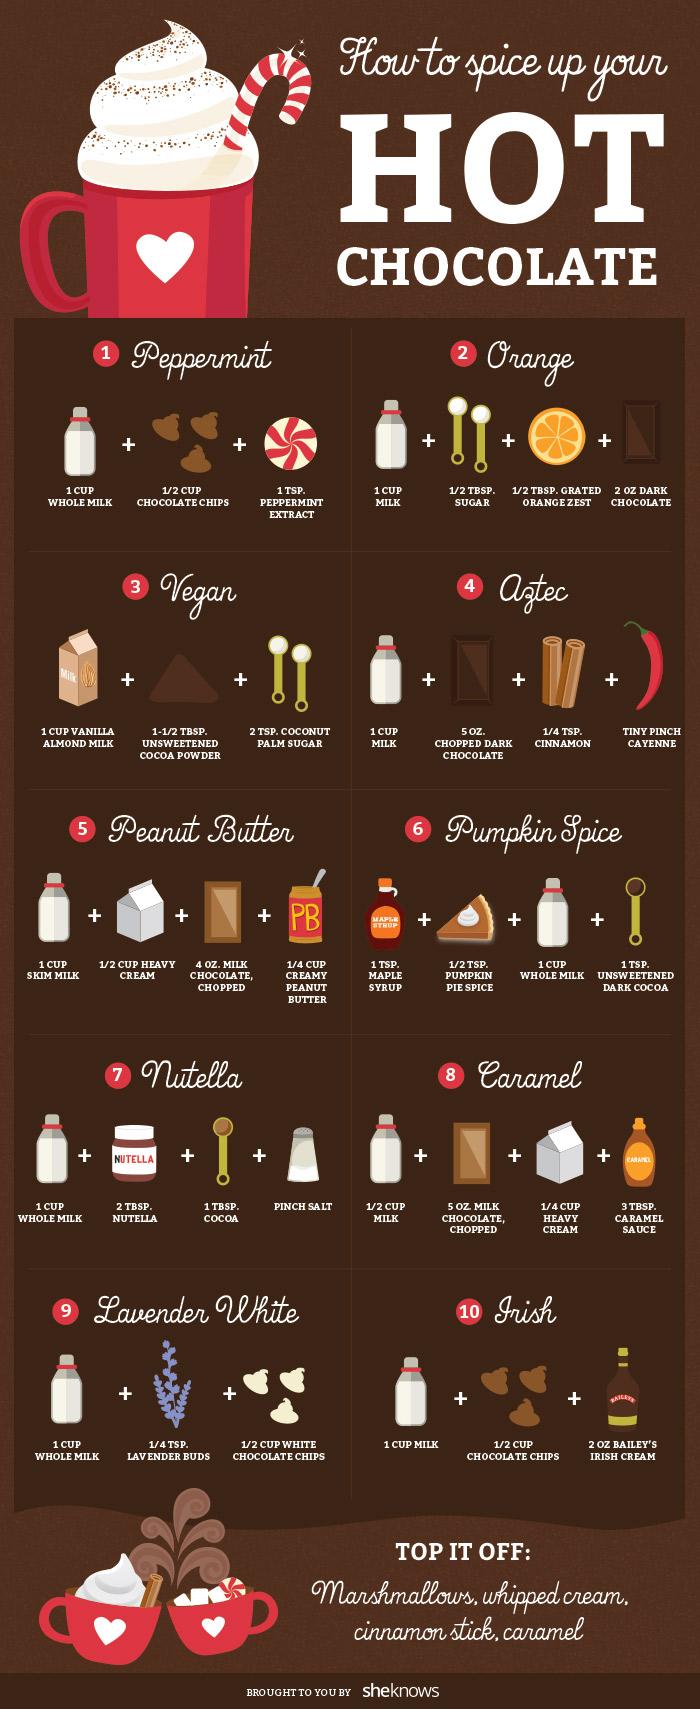 Fabulous Hot Chocolate Ideas!